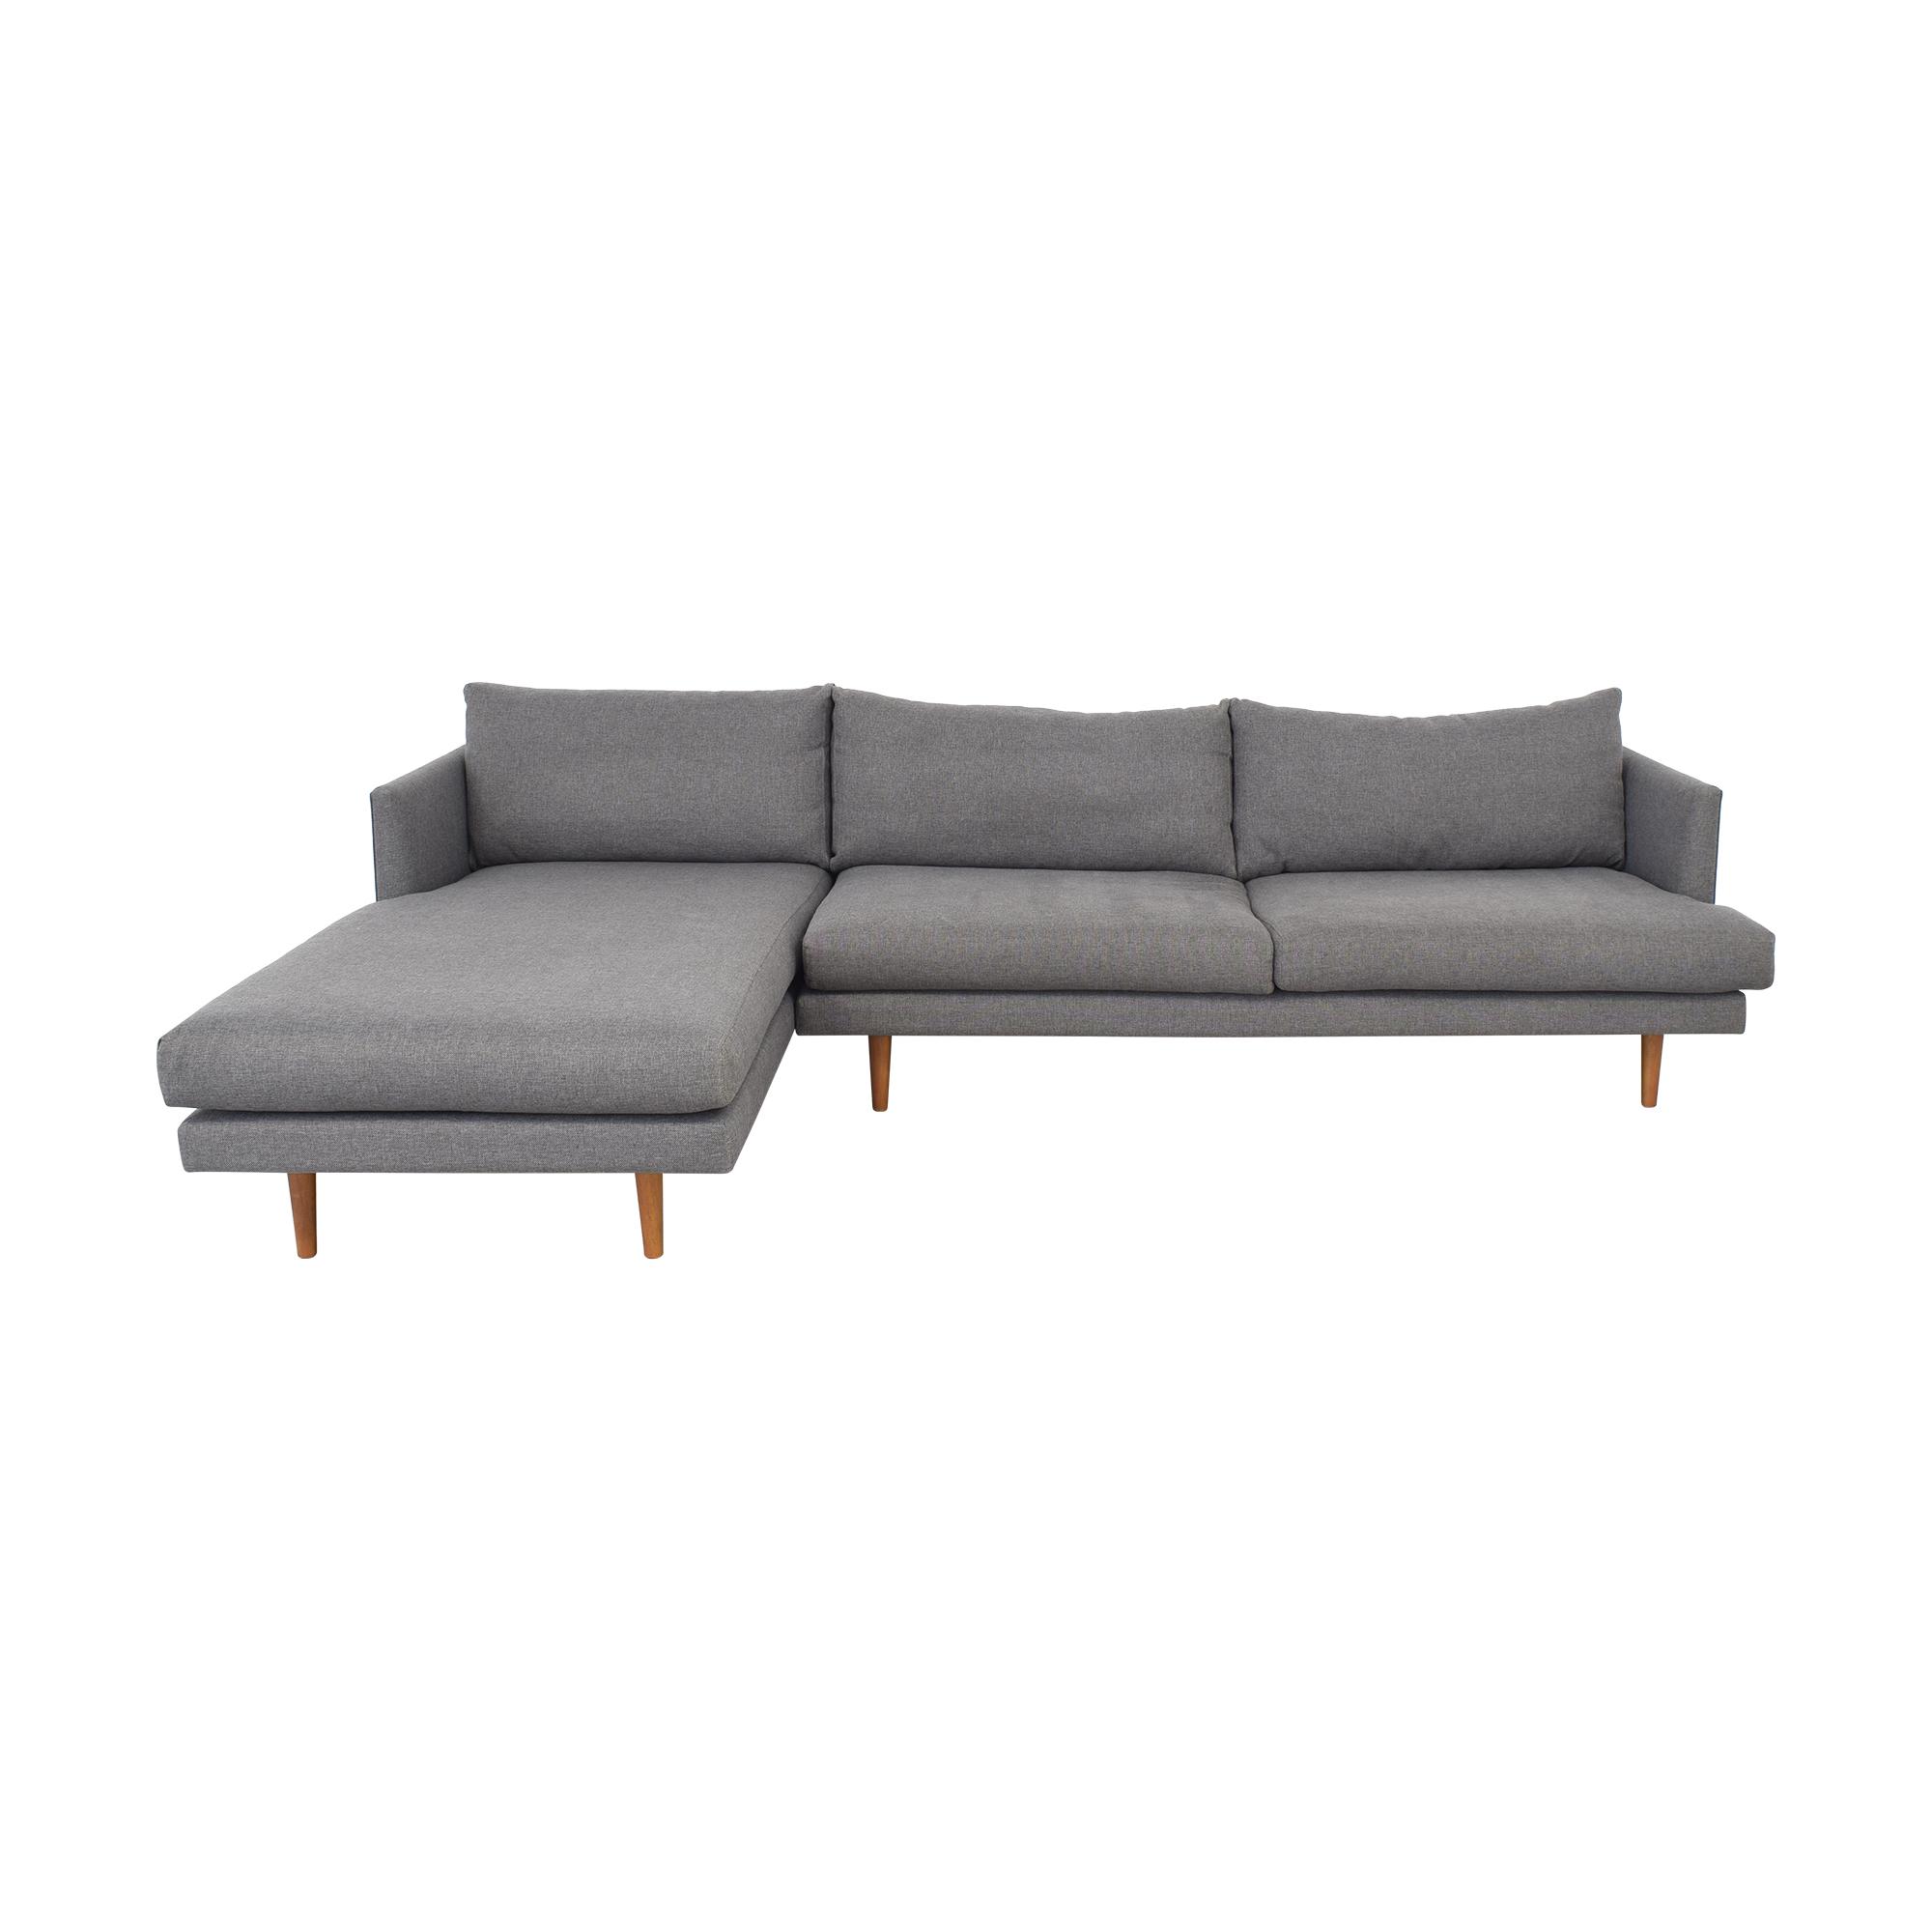 buy Article Article Burrard Left Sectional Sofa online